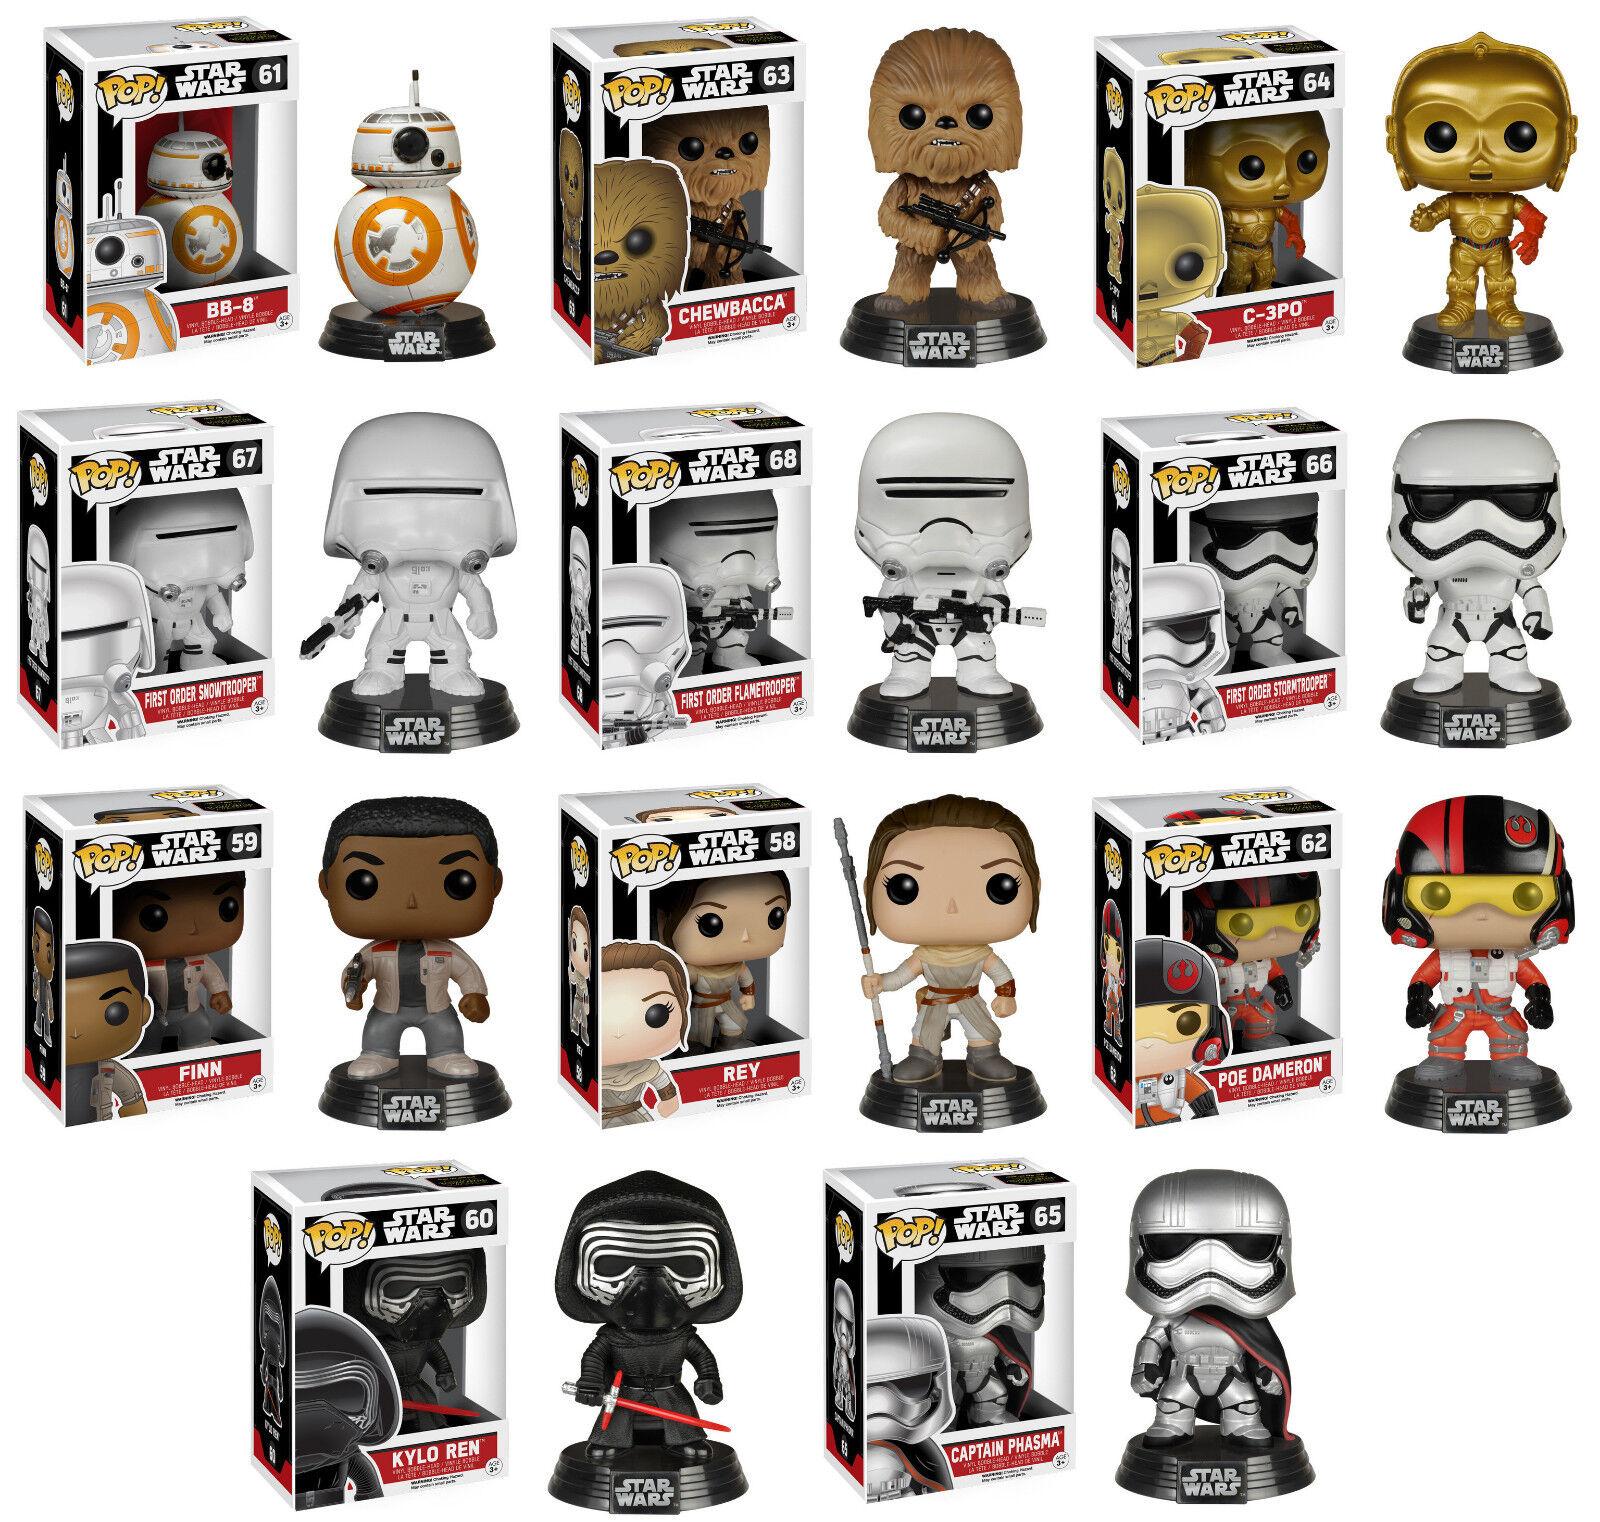 Star Wars VII Force Awakens Funko Pop 11 Figure Set BB-8 Finn Rey C3PO Kylo Ren